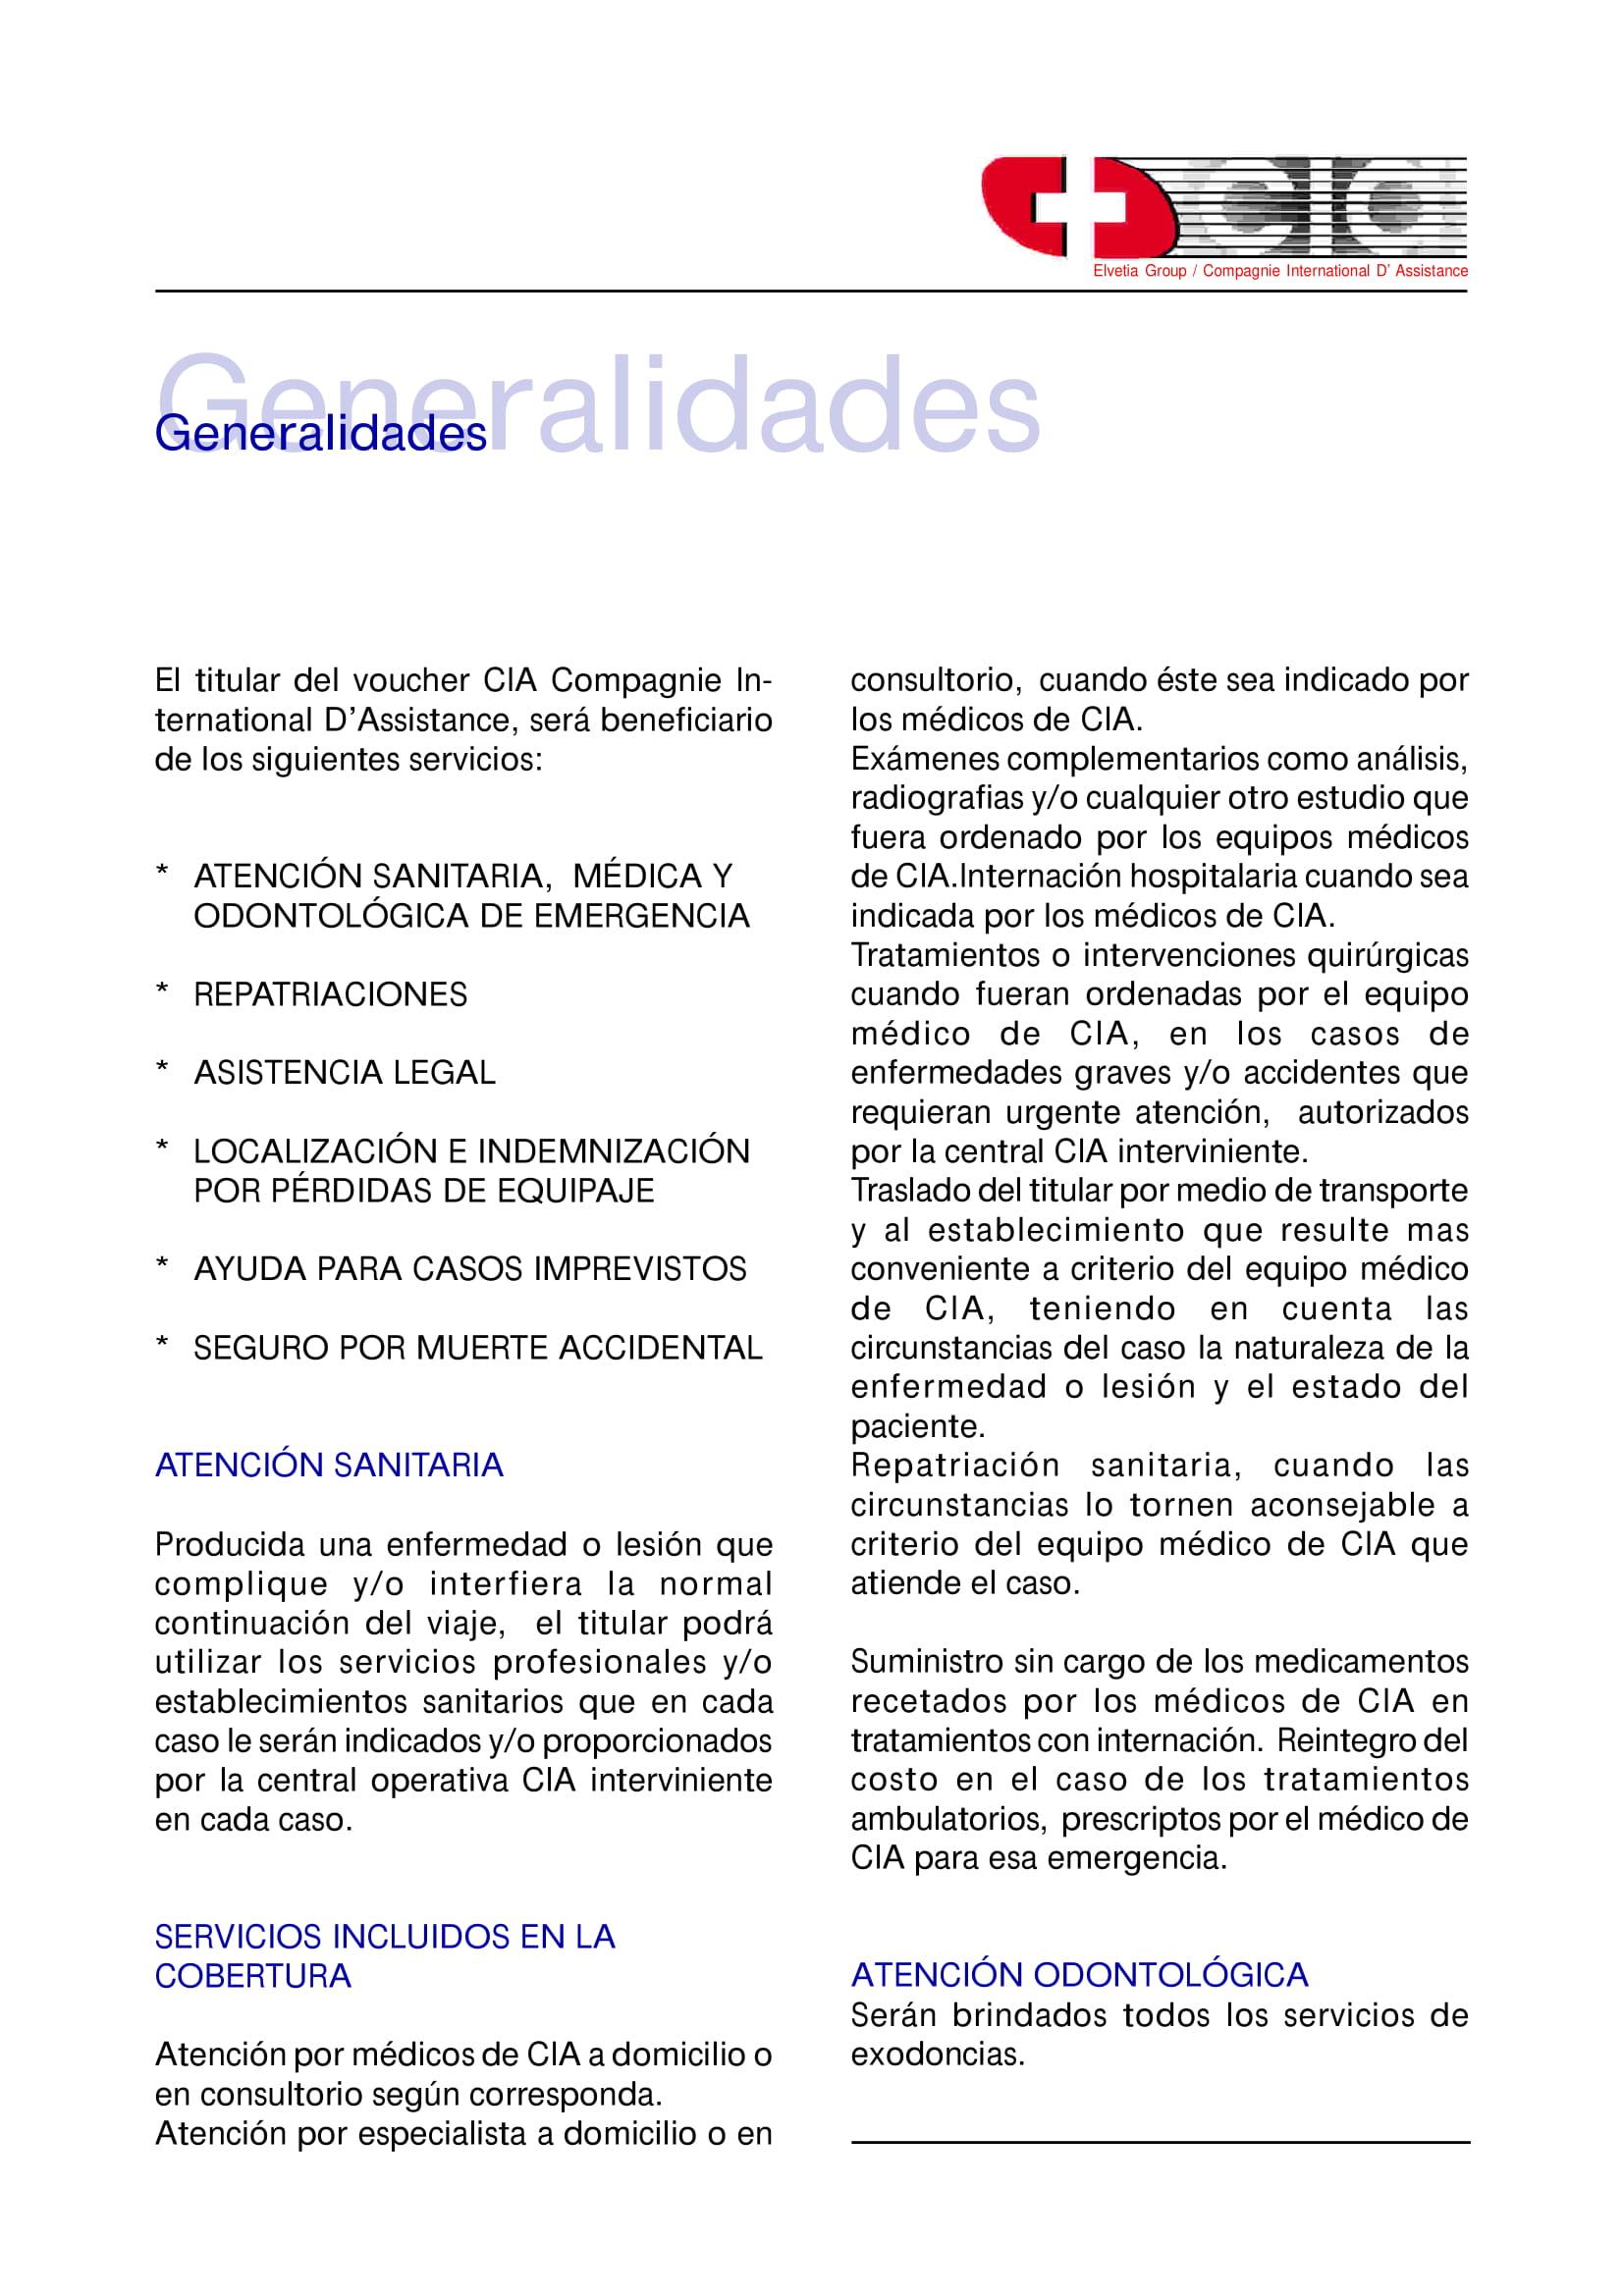 Company profile esp.-3